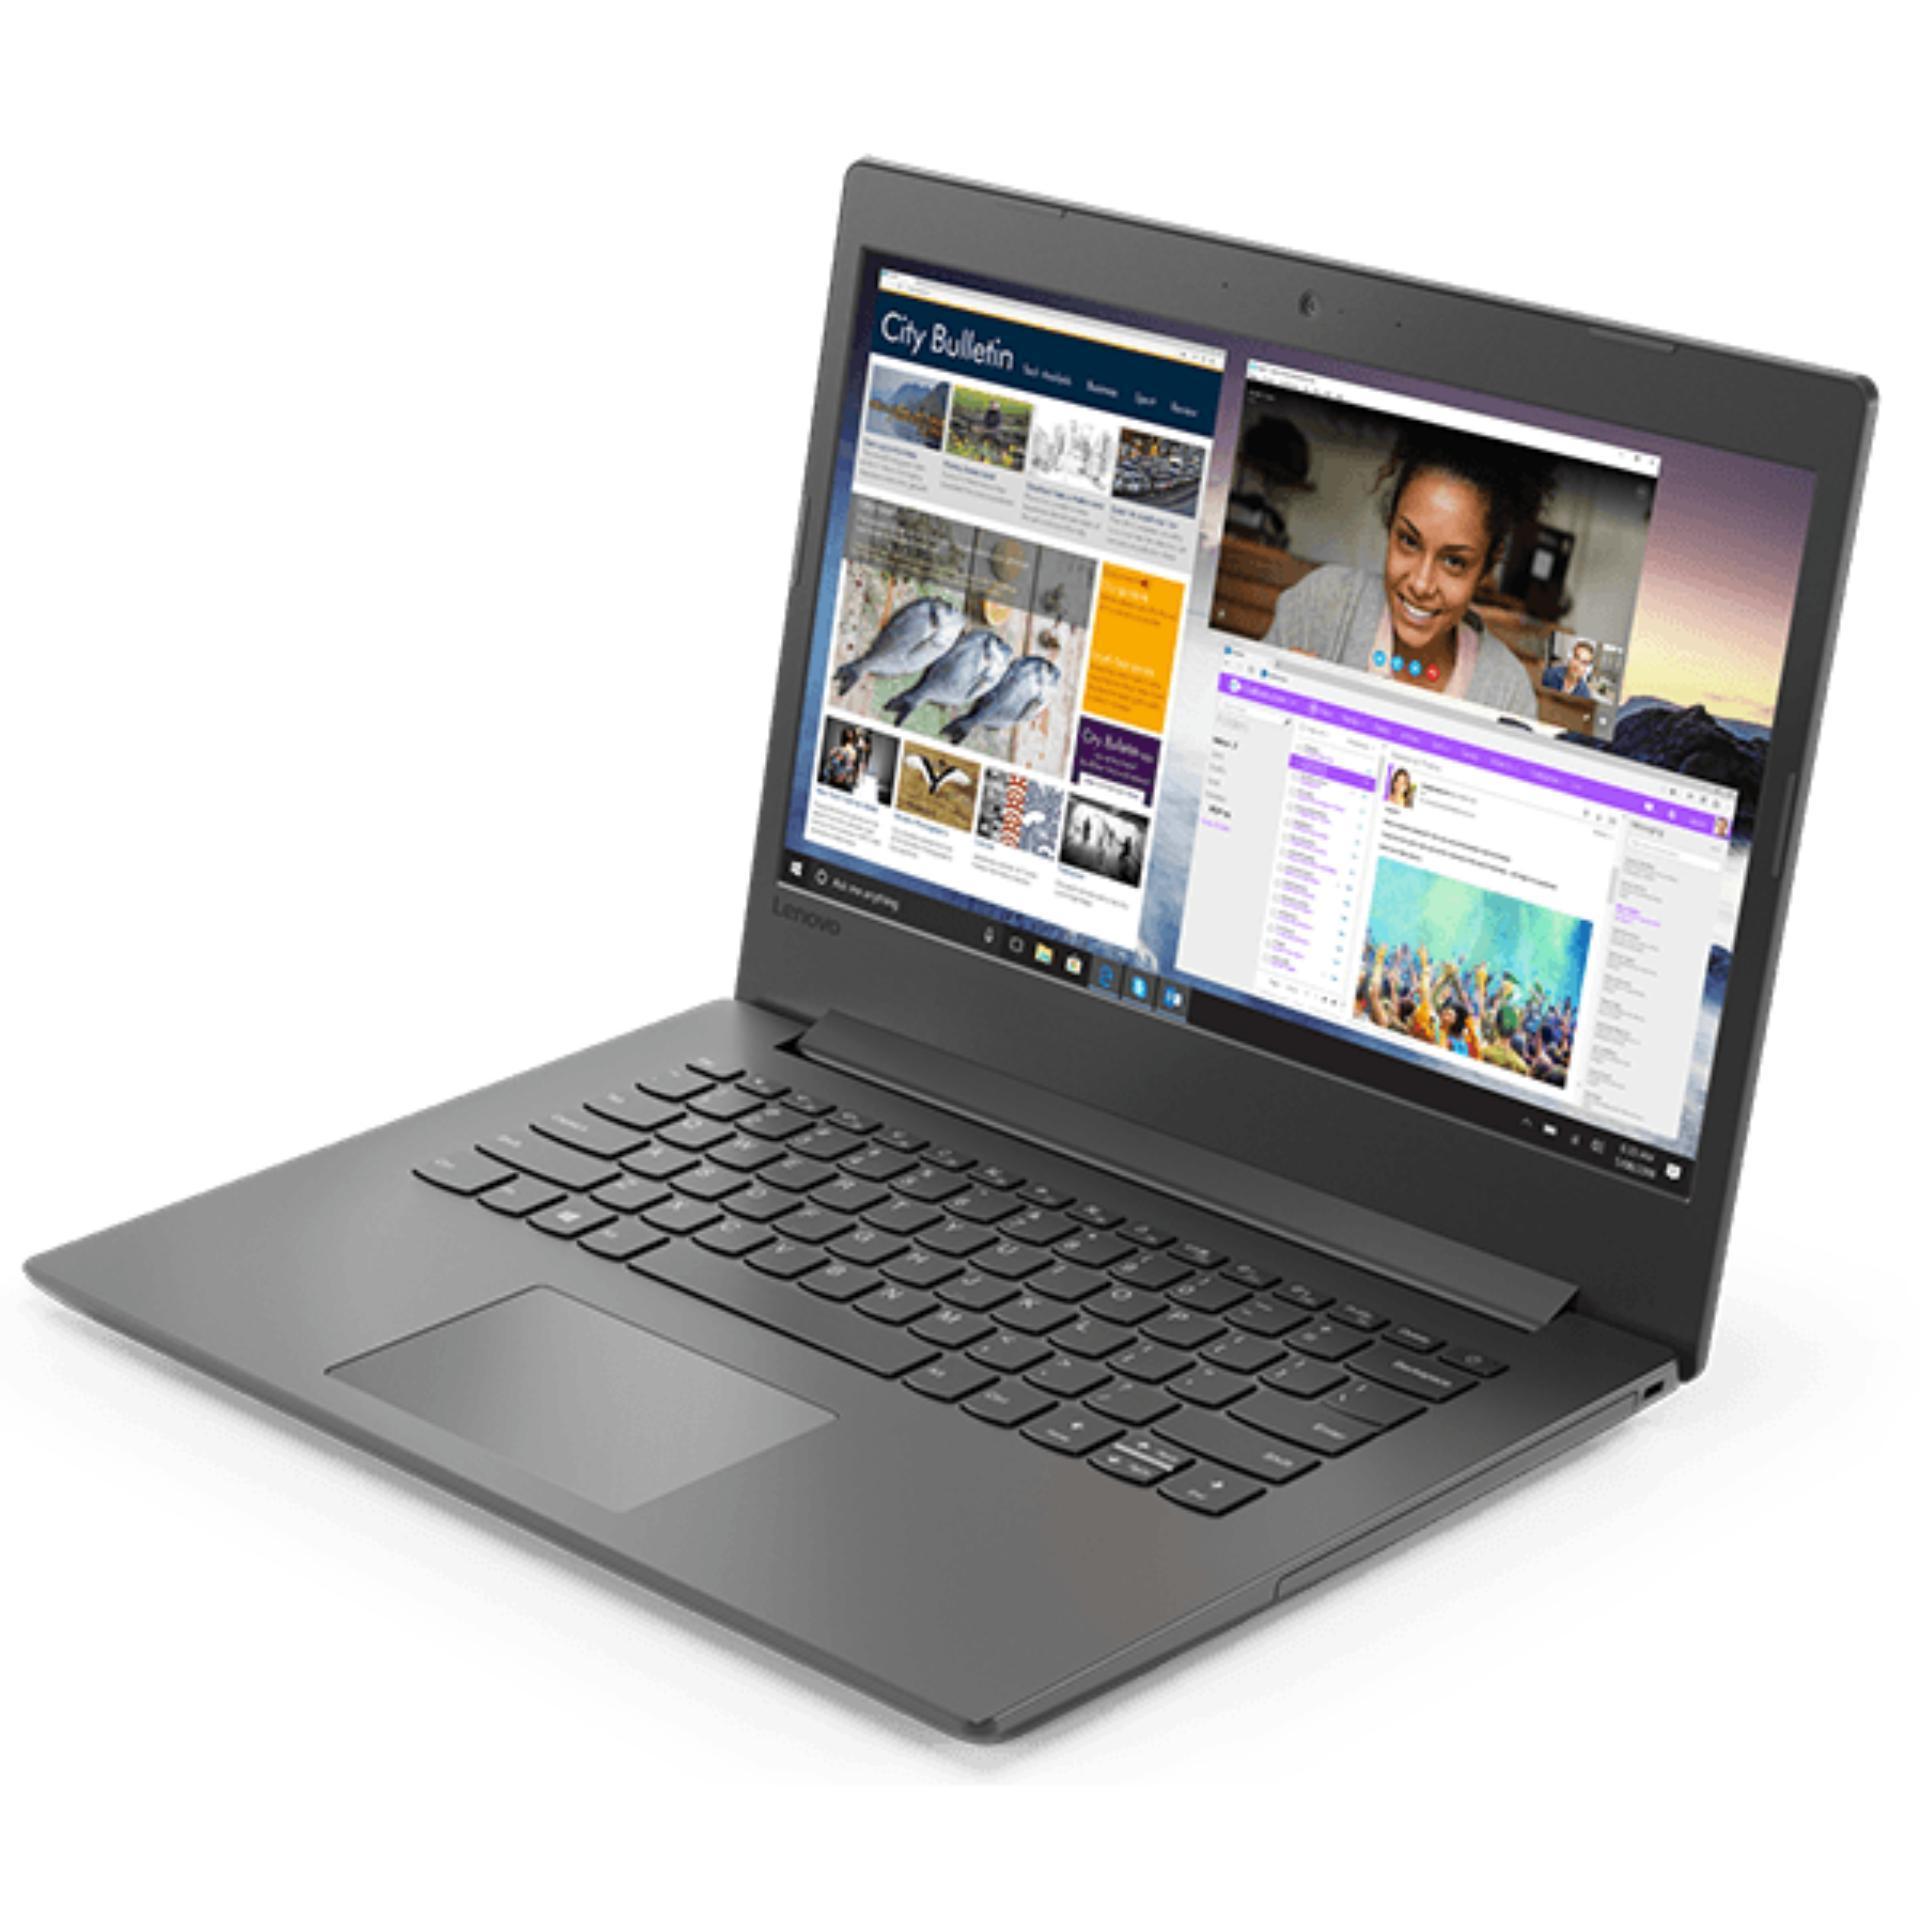 Harga lenovo a5, harga lenovo a6 note. Spesifikasi Lenovo Ideapad 130 14ikb 1mid dan Harga Terbaru April 2021   Spesifikasi Laptop ID